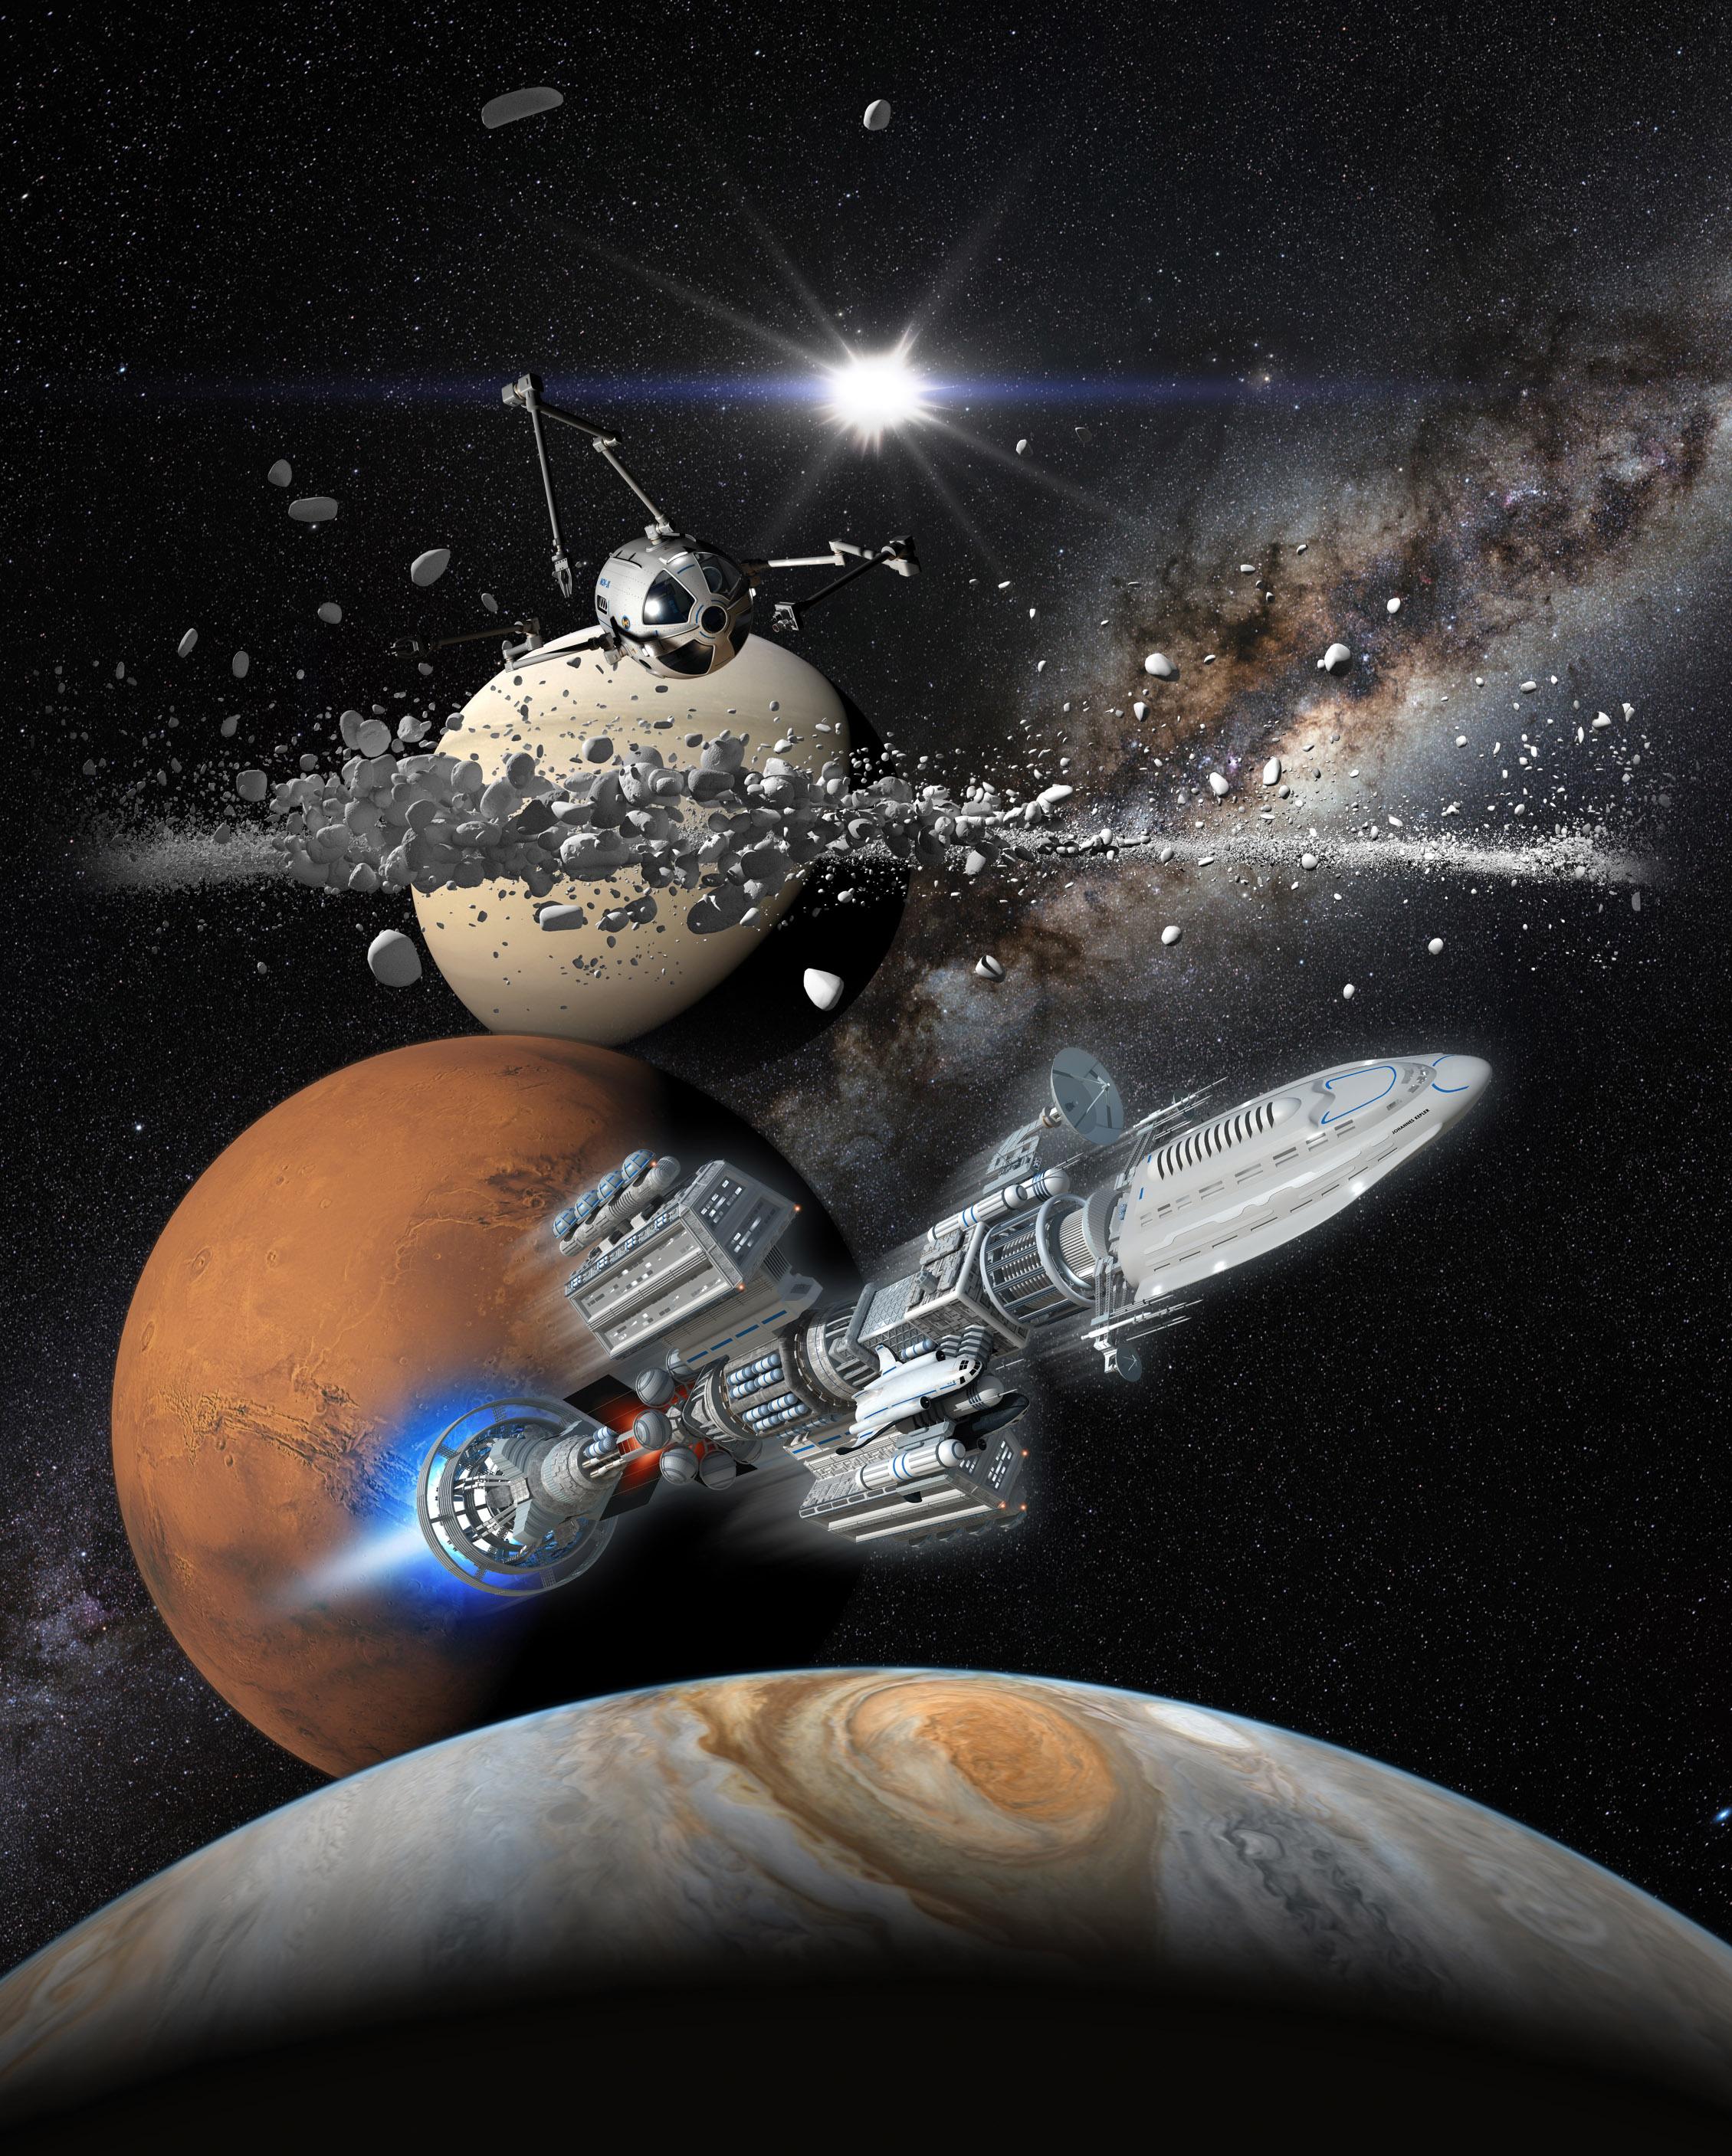 Bilddatei: planeten_titelbild_kl-c-lwl-perdok.jpg